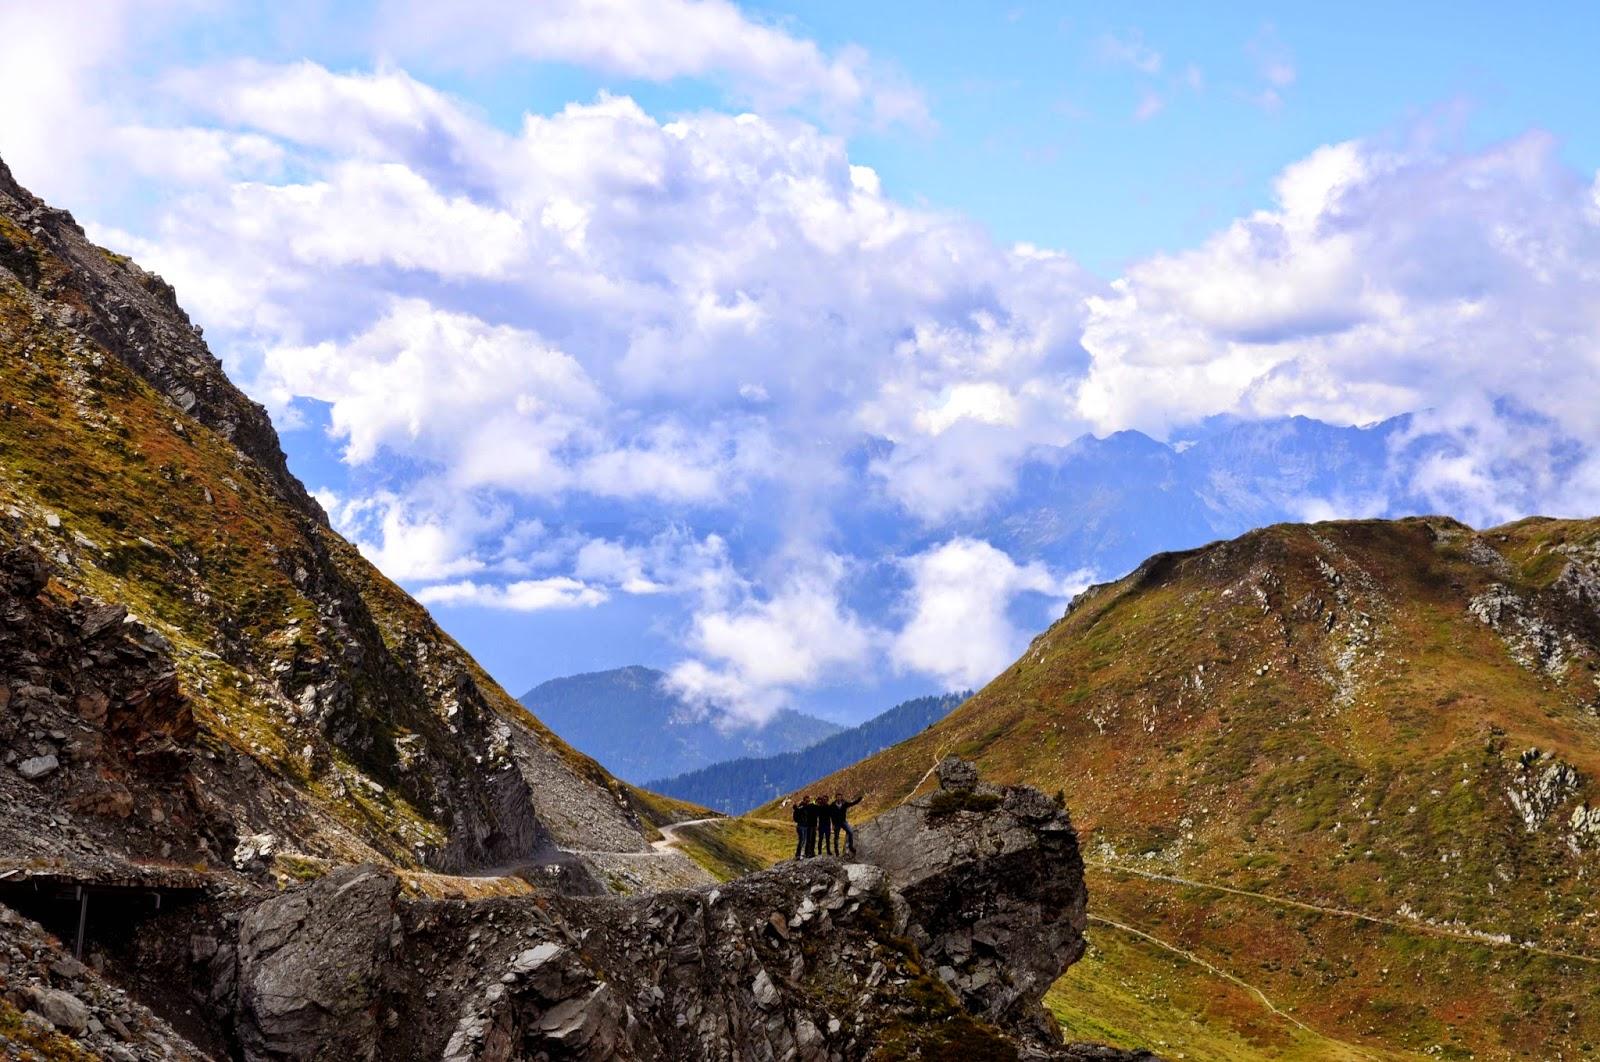 Col de Mines Verbier Randonnée Hike excursión Lac des Vaux